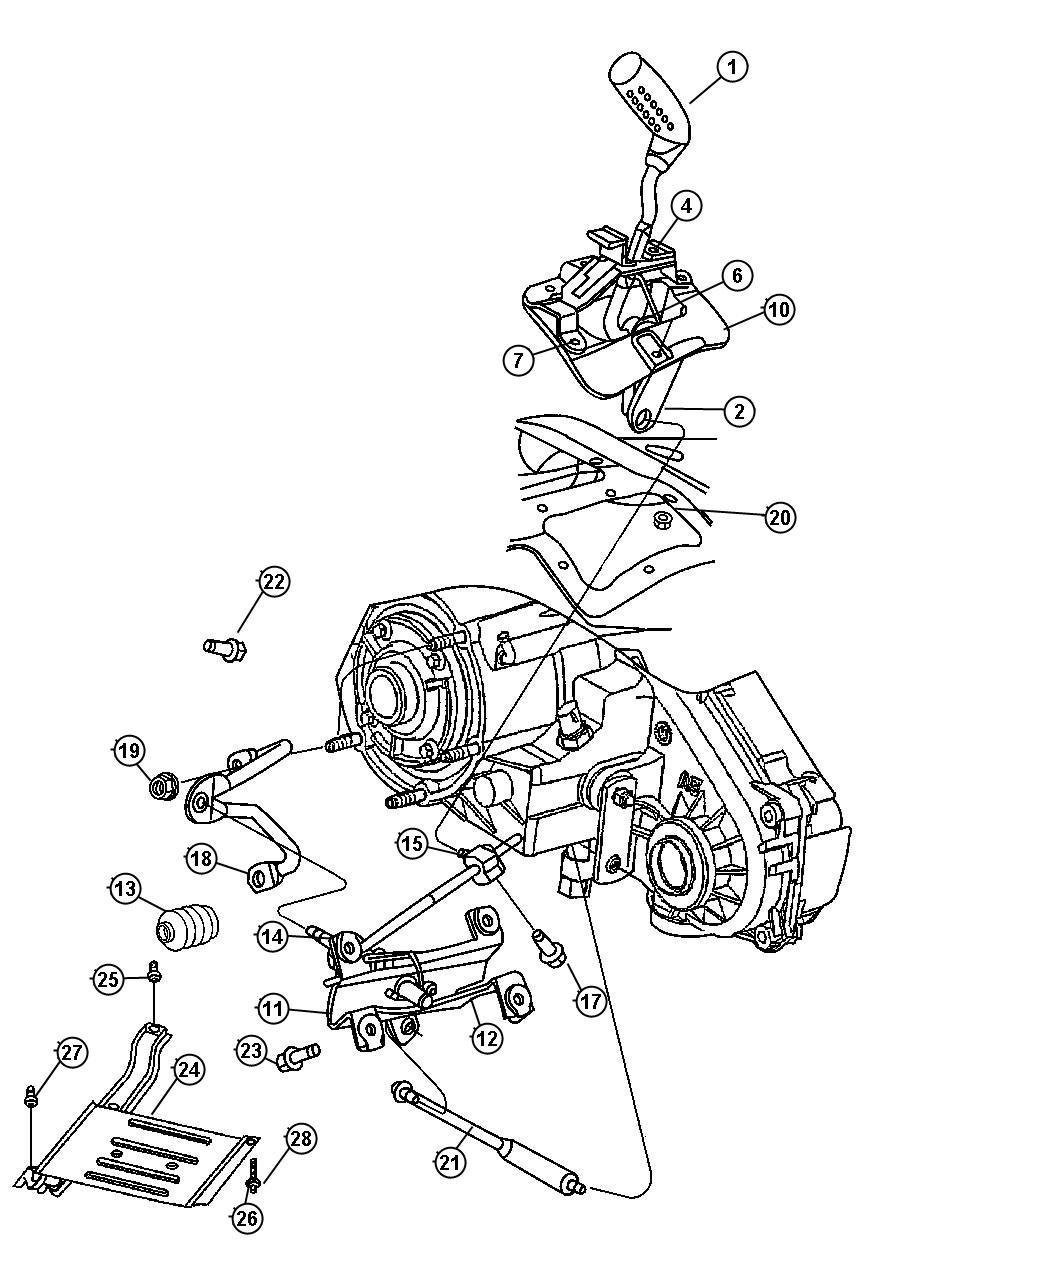 Jeep Wrangler Bracket Torque Shaft Marketing Dhw